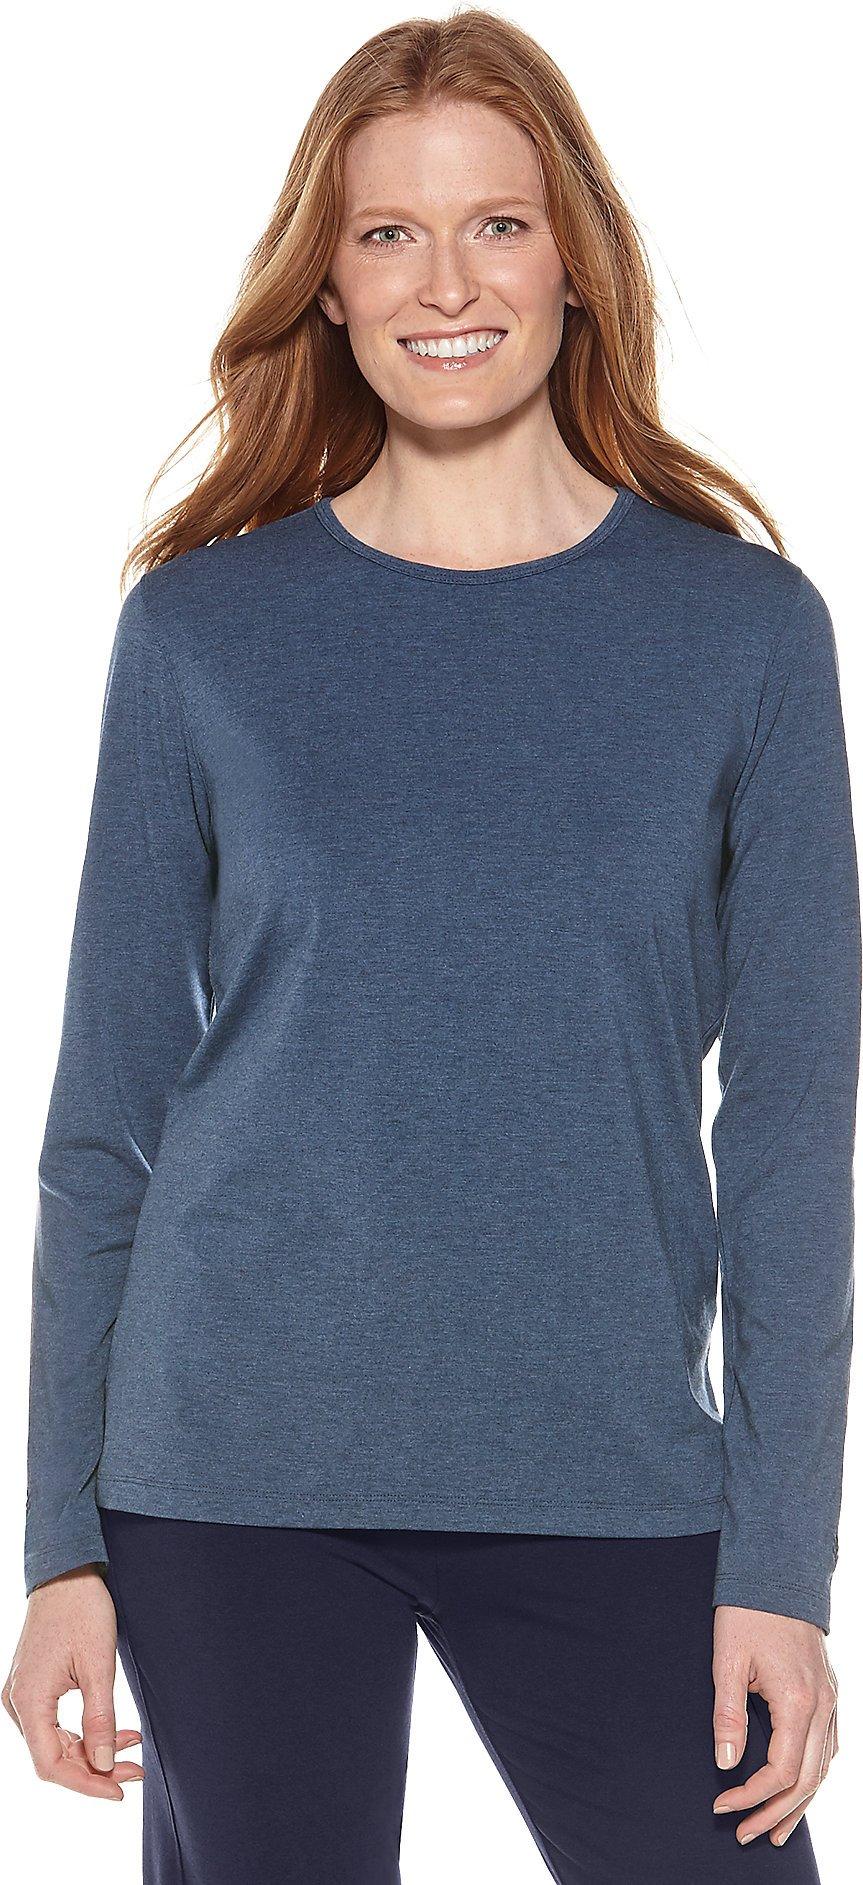 Coolibar UPF 50+ Women's Long Sleeve Everyday T-Shirt - Sun Protective (Large- Denim Blue Heather)